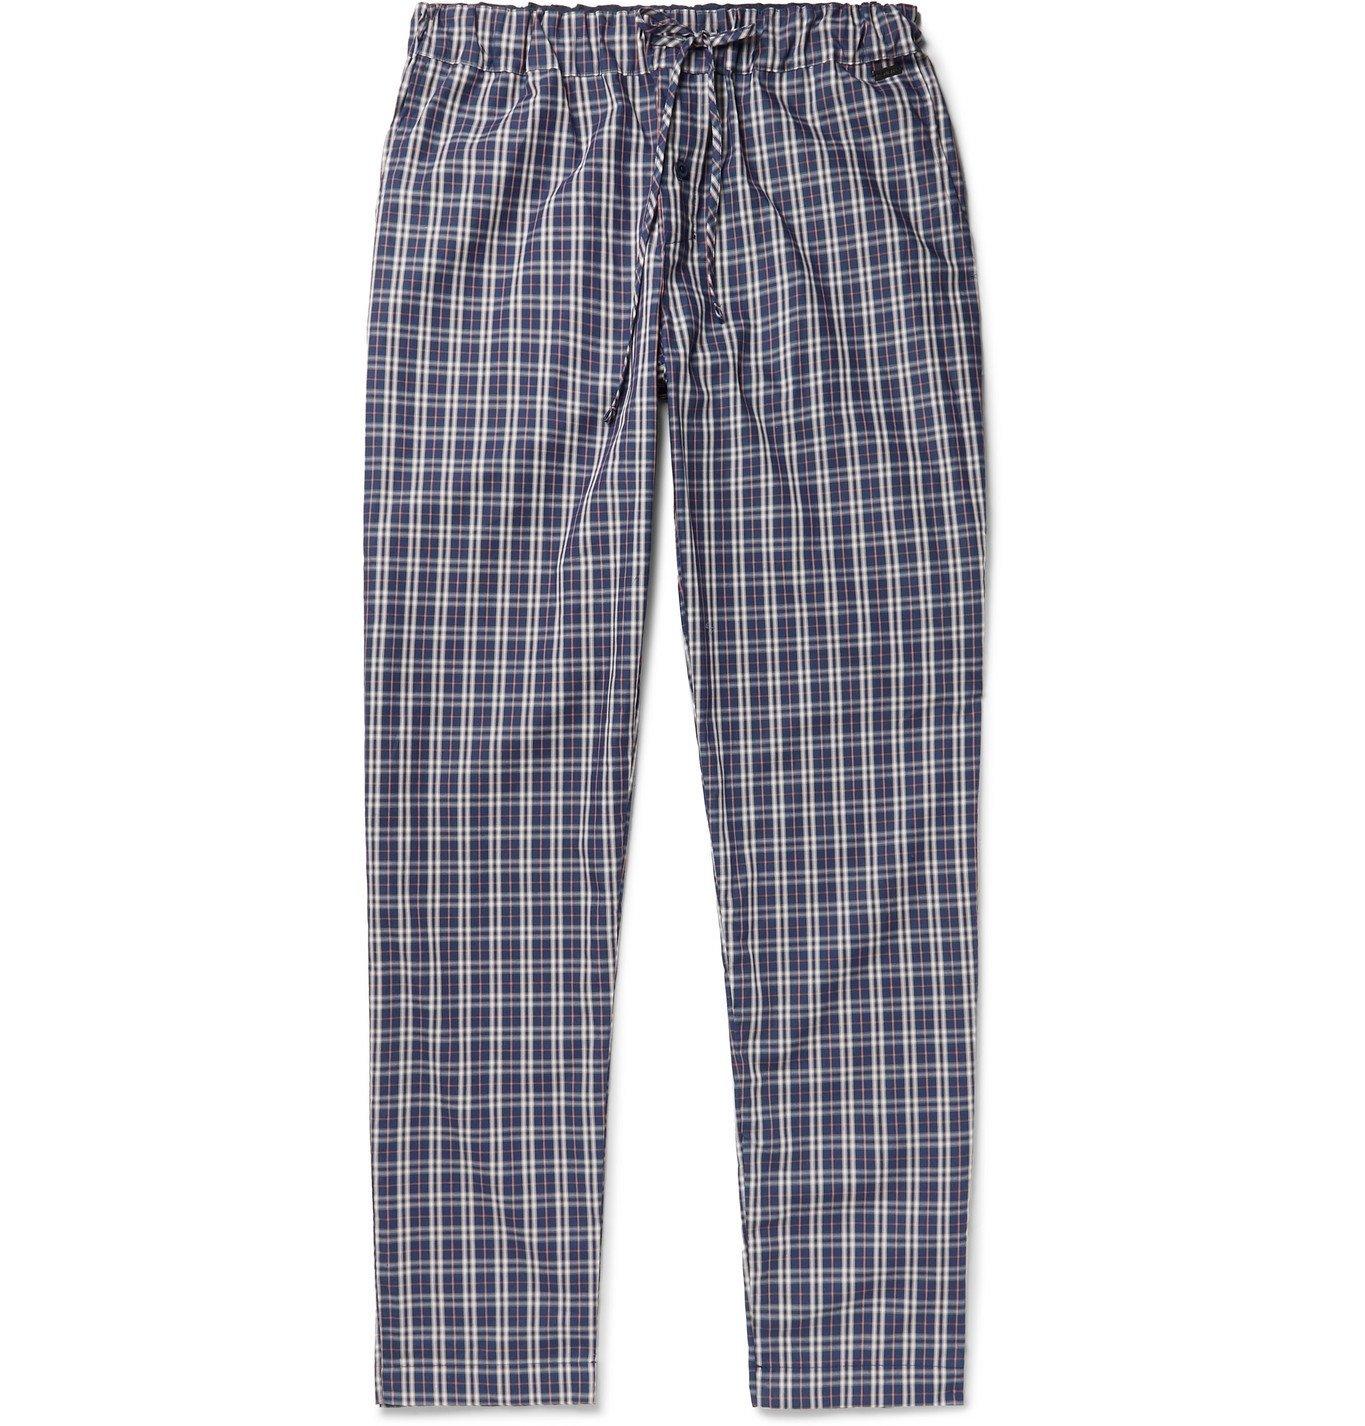 Hanro - Night & Day Checked Cotton Pyjama Trousers - Multi